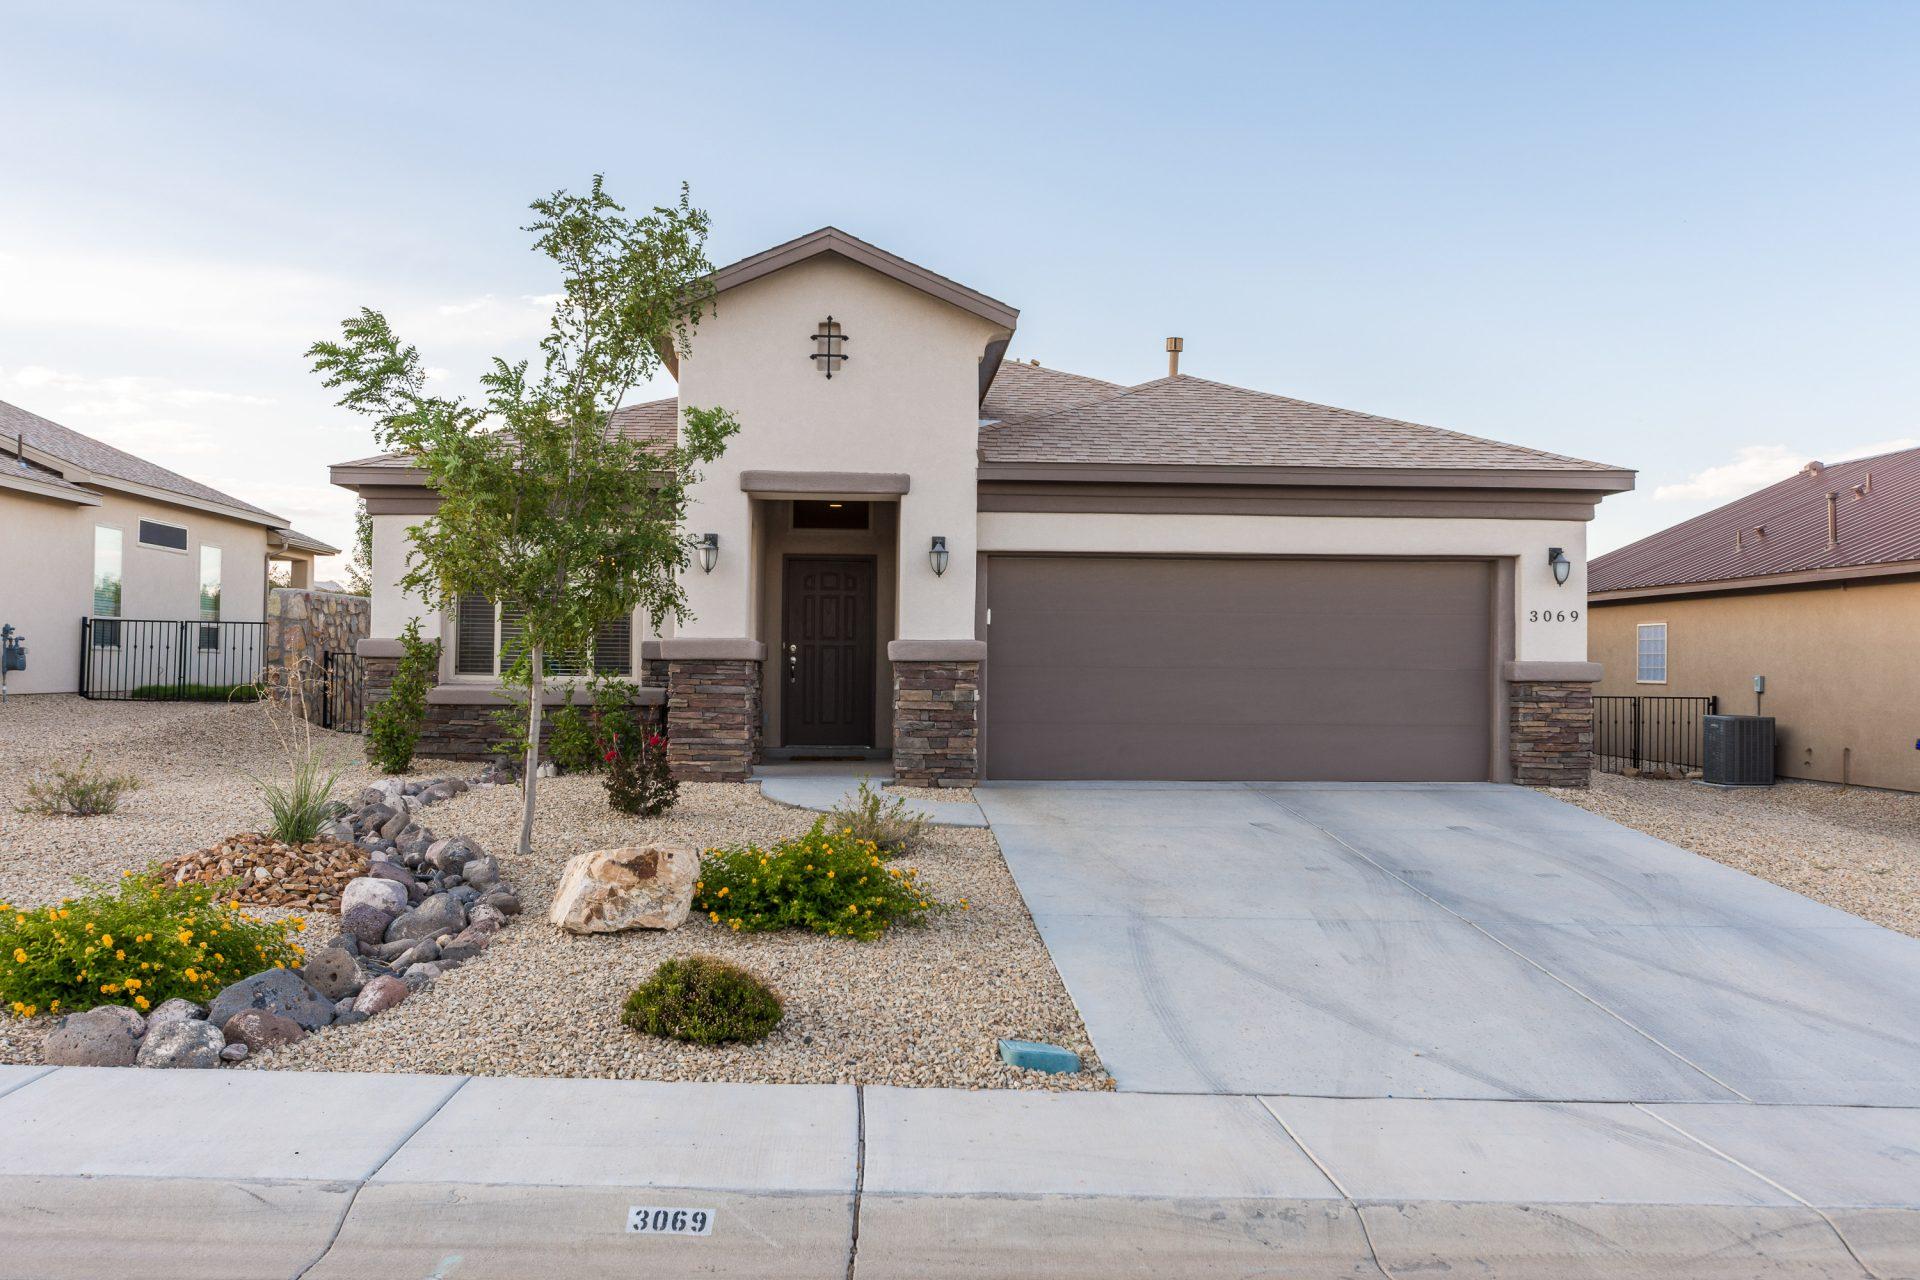 3069 Agua Ladoso Avenue, Las Cruces NM 88012